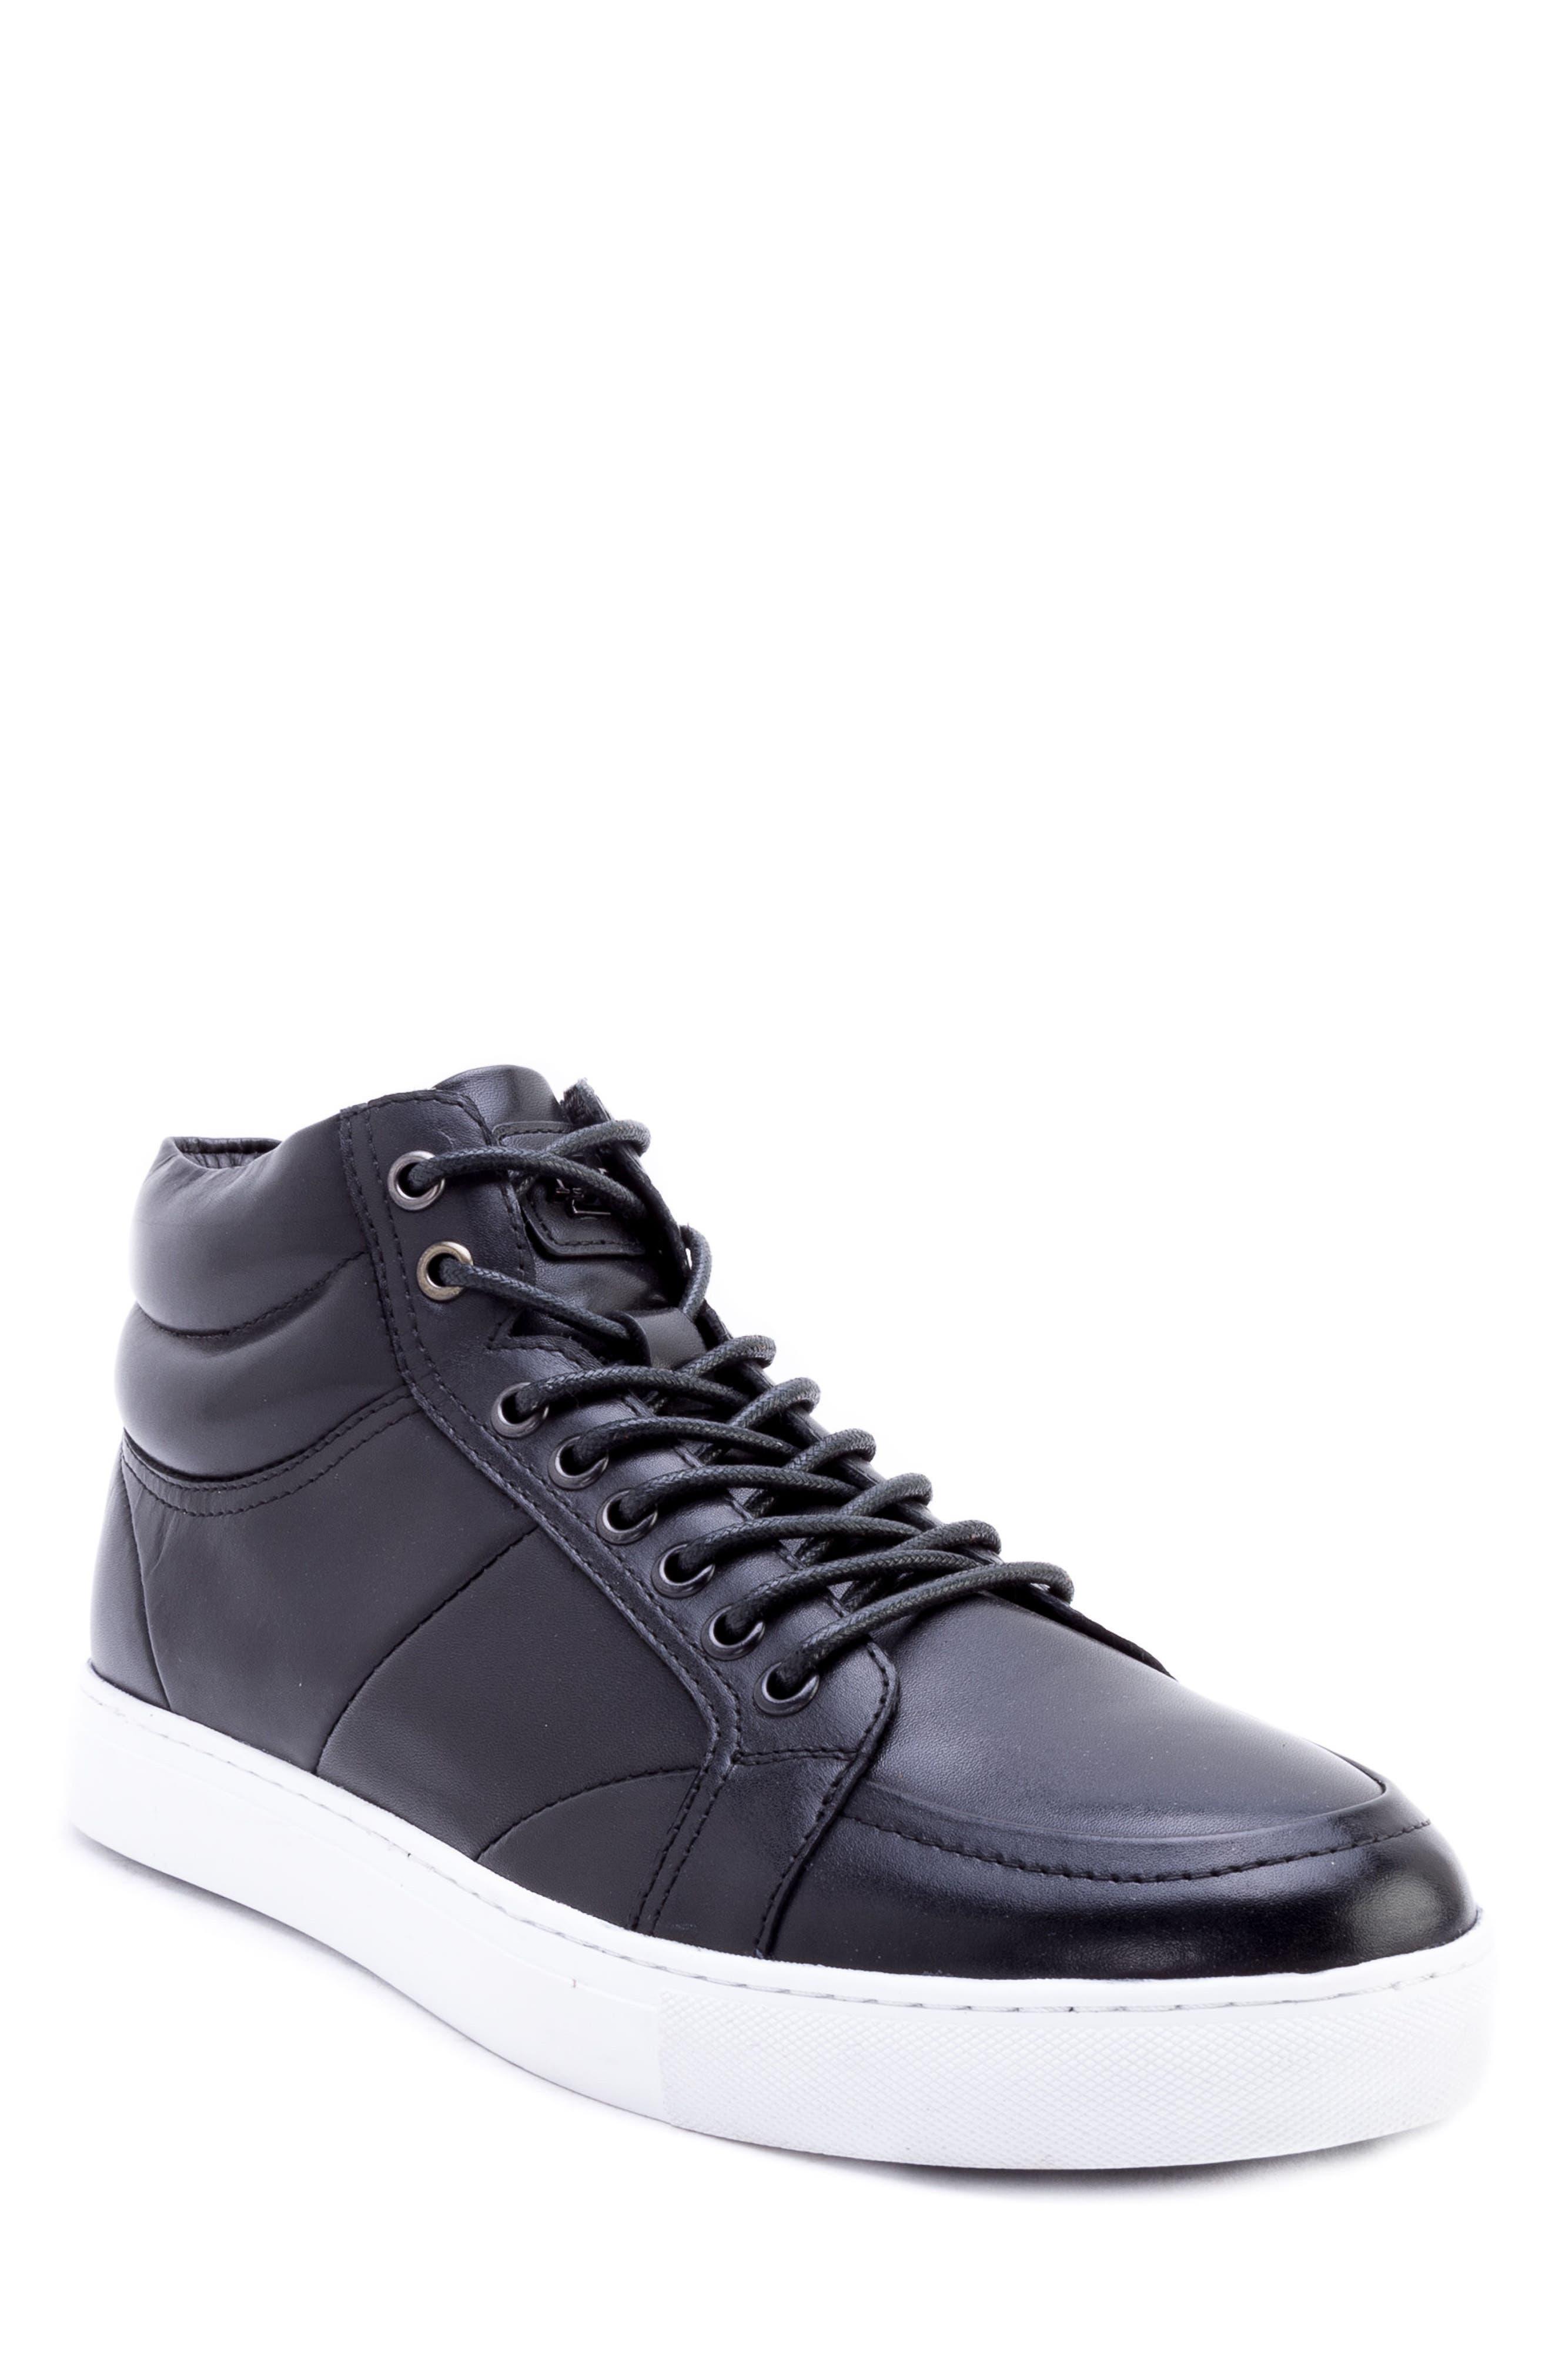 Tassel Mid Top Sneaker,                         Main,                         color, BLACK LEATHER